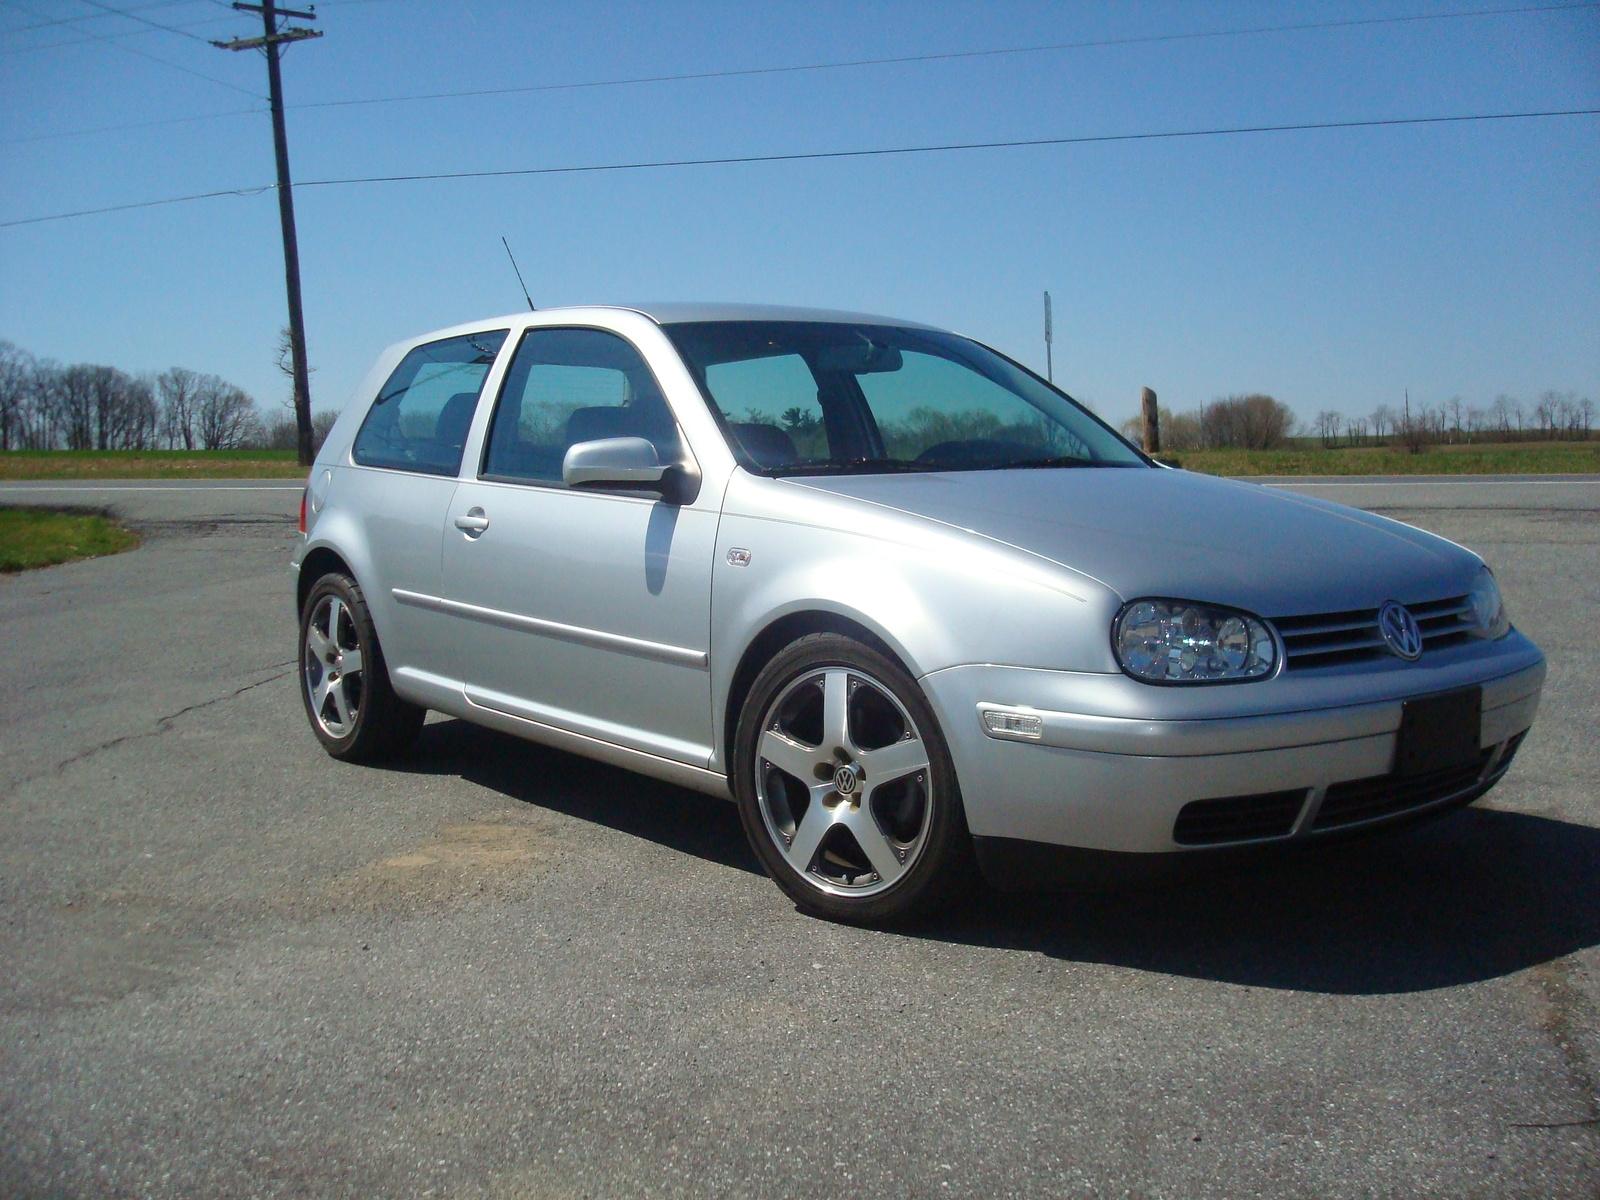 Volkswagen Gti Vr6 Specs >> 2002 Vw Gti Vr6 Specs